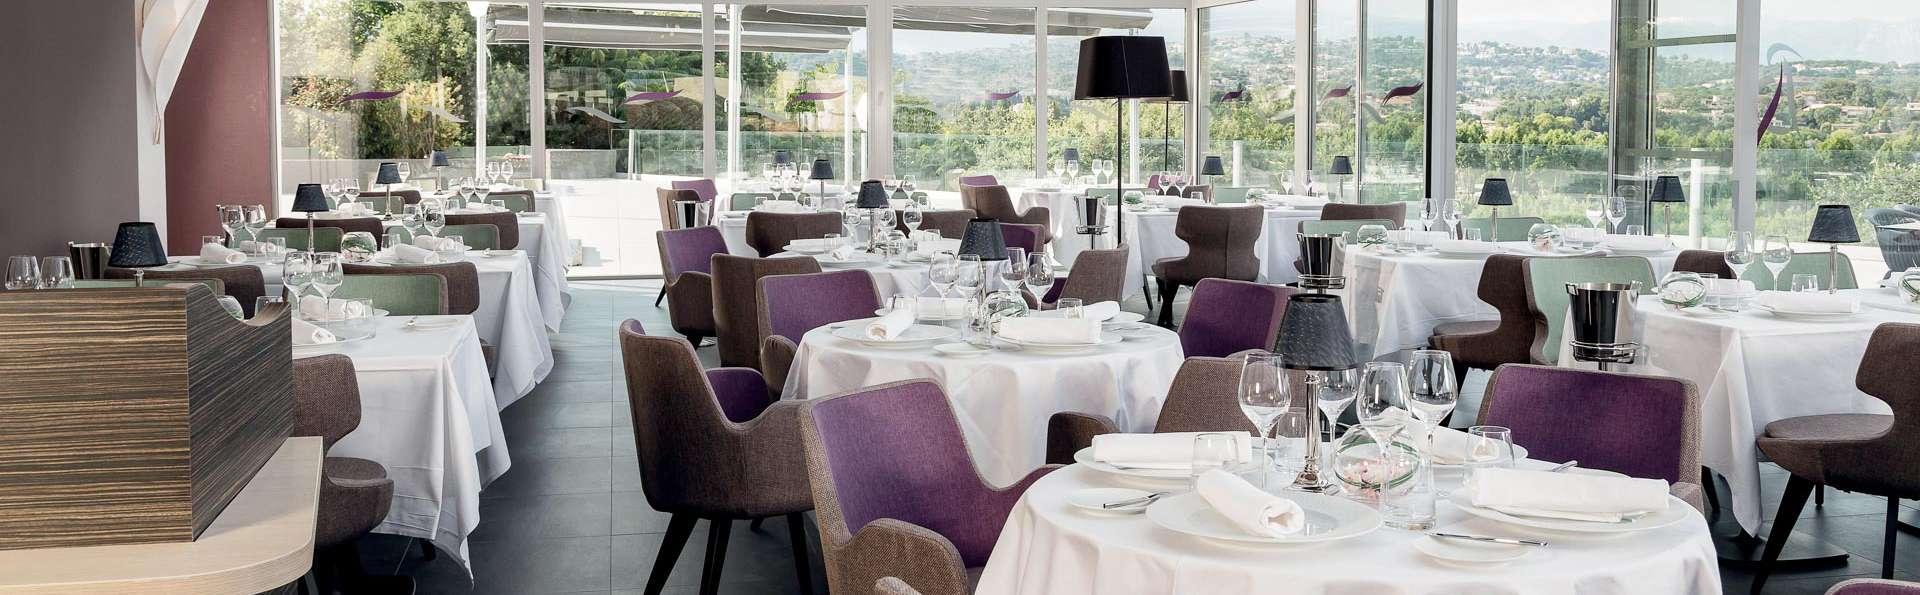 Relaxweekend inclusief diner in Antibes